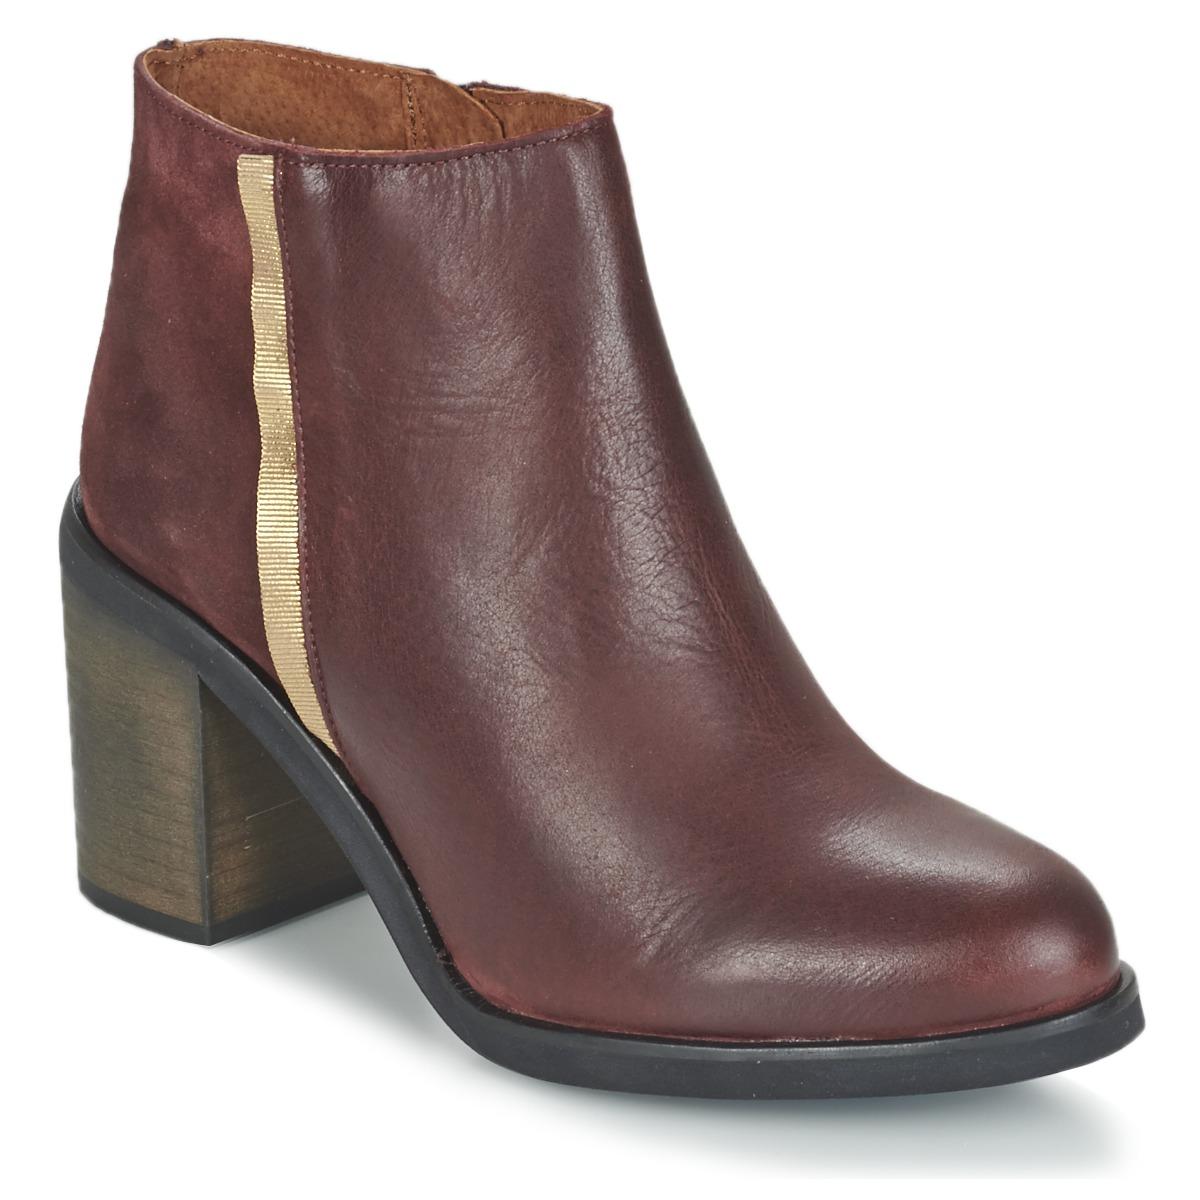 Casual Attitude FELICITA Rot - Kostenloser Versand bei Spartoode ! - Schuhe Low Boots Damen 47,99 €